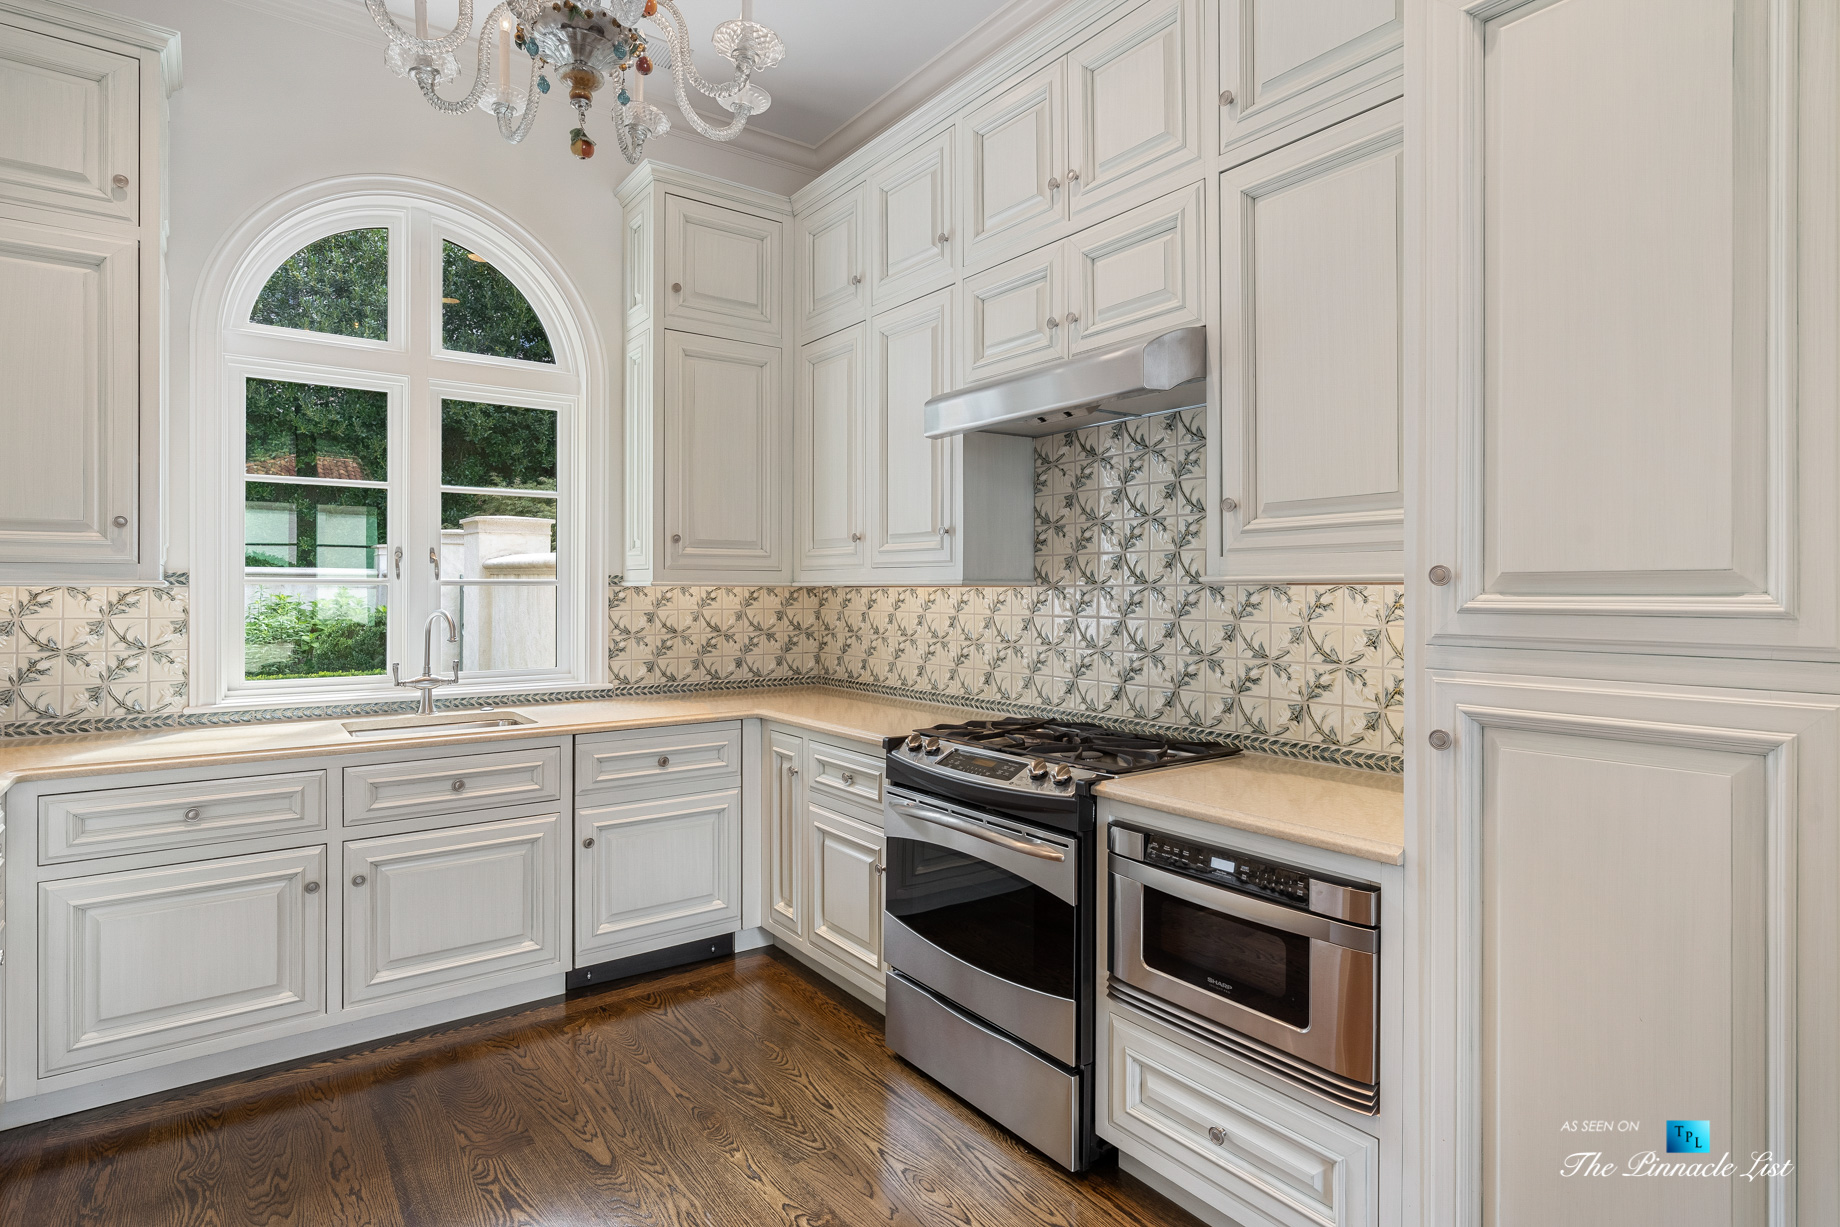 439 Blackland Rd NW, Atlanta, GA, USA - Secondary Kitchen - Luxury Real Estate - Tuxedo Park Mediterranean Mansion Home